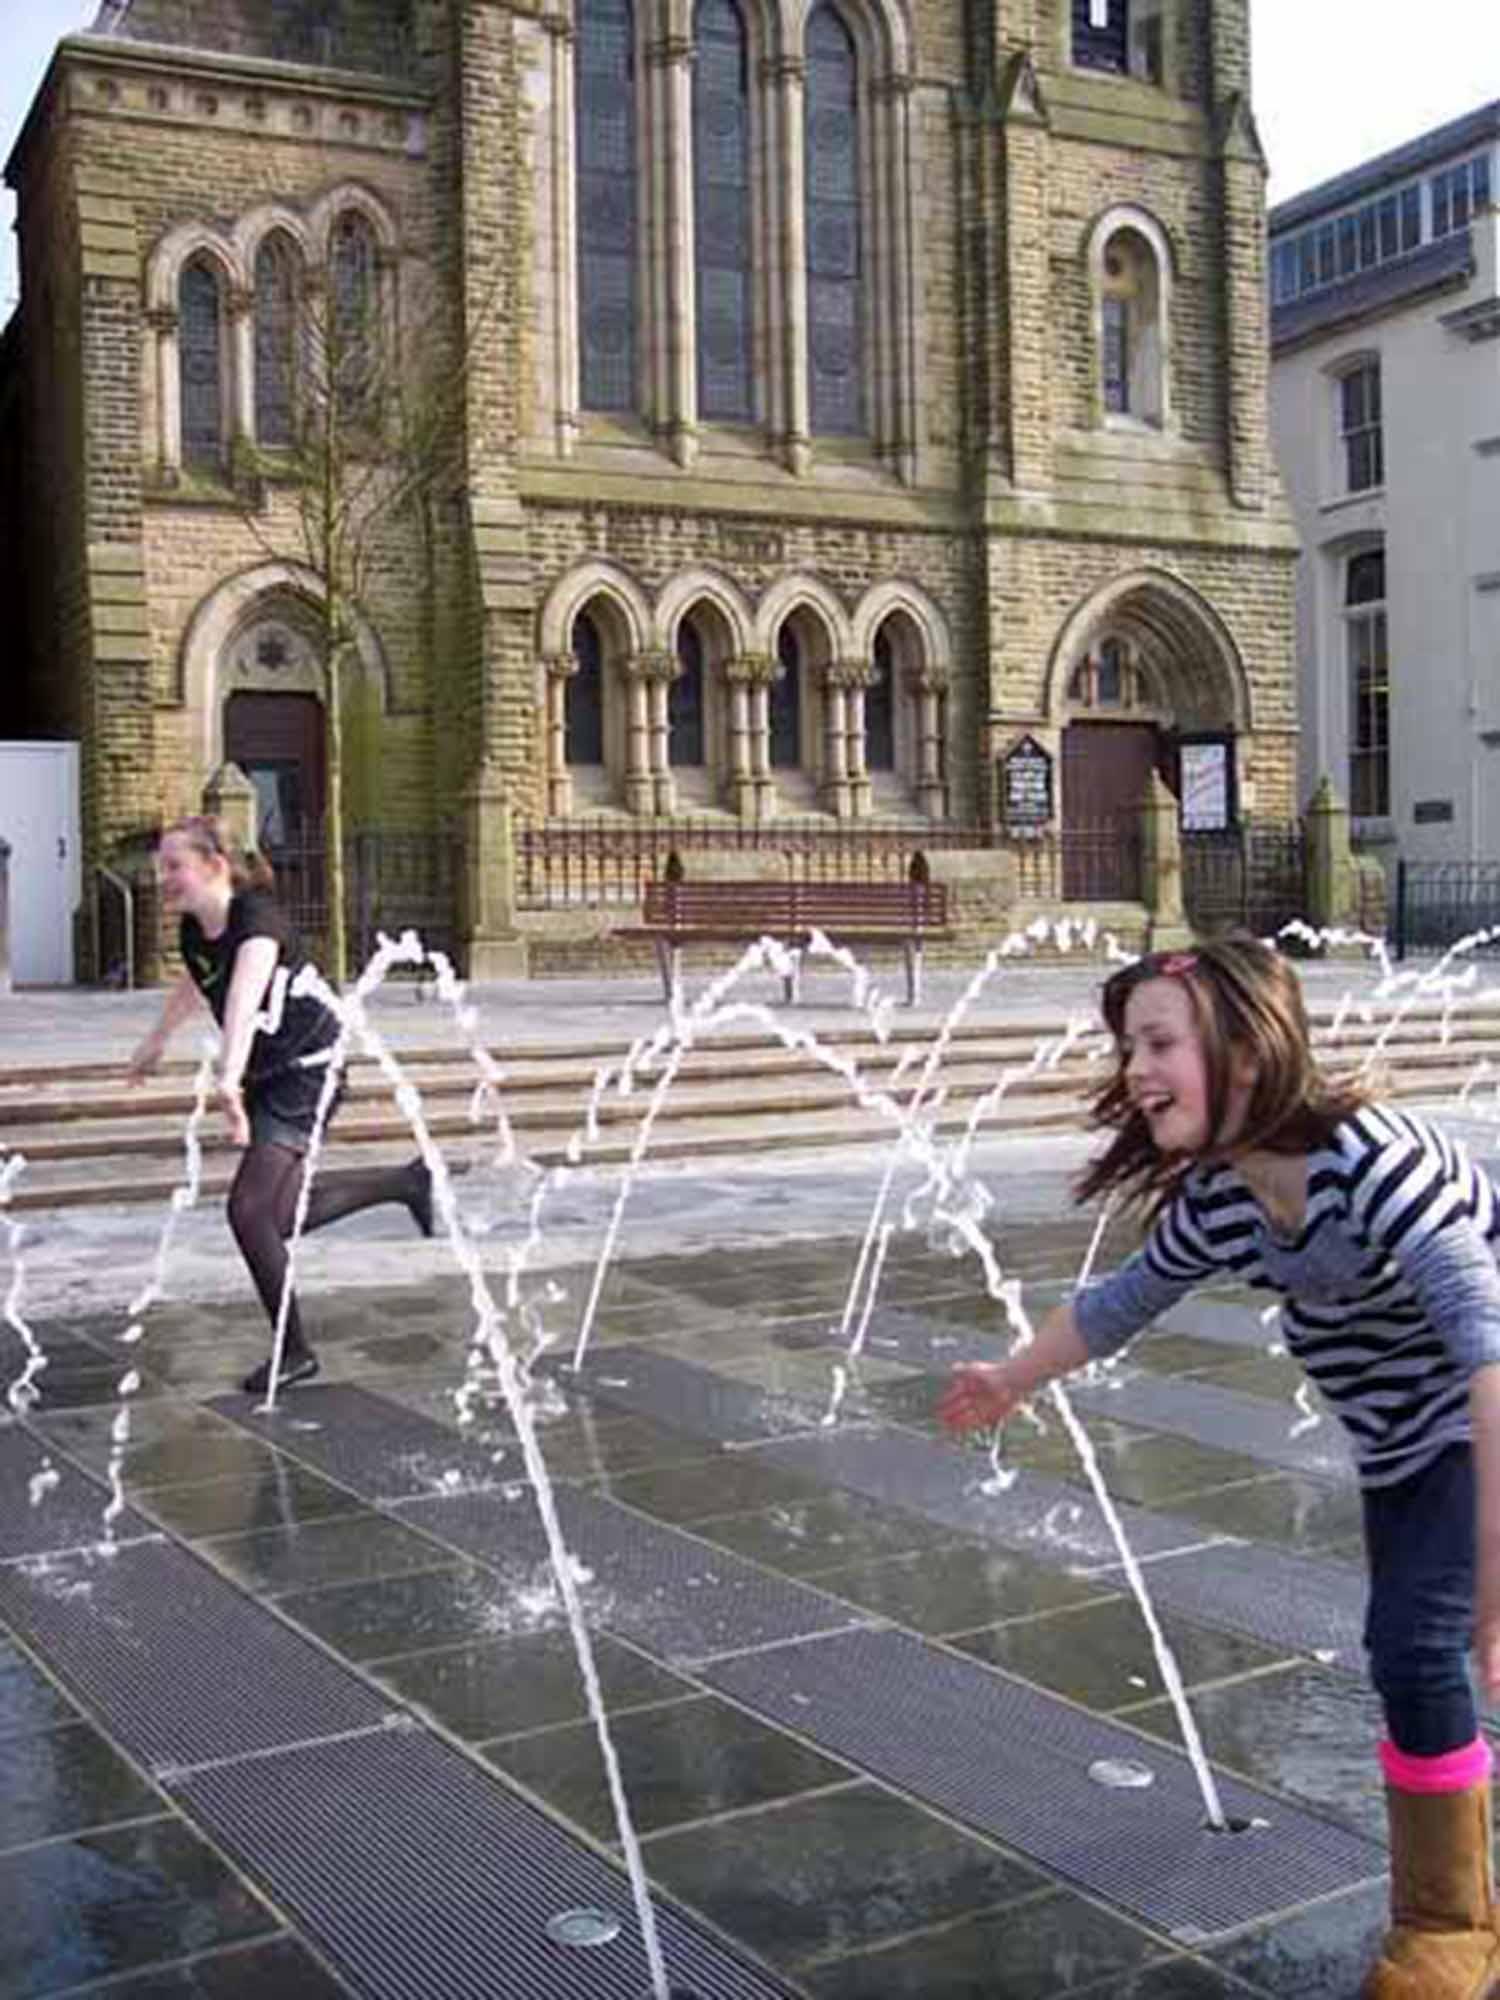 Y Maes Caernarfon Water feature with Presbyterian Church beyond.jpg